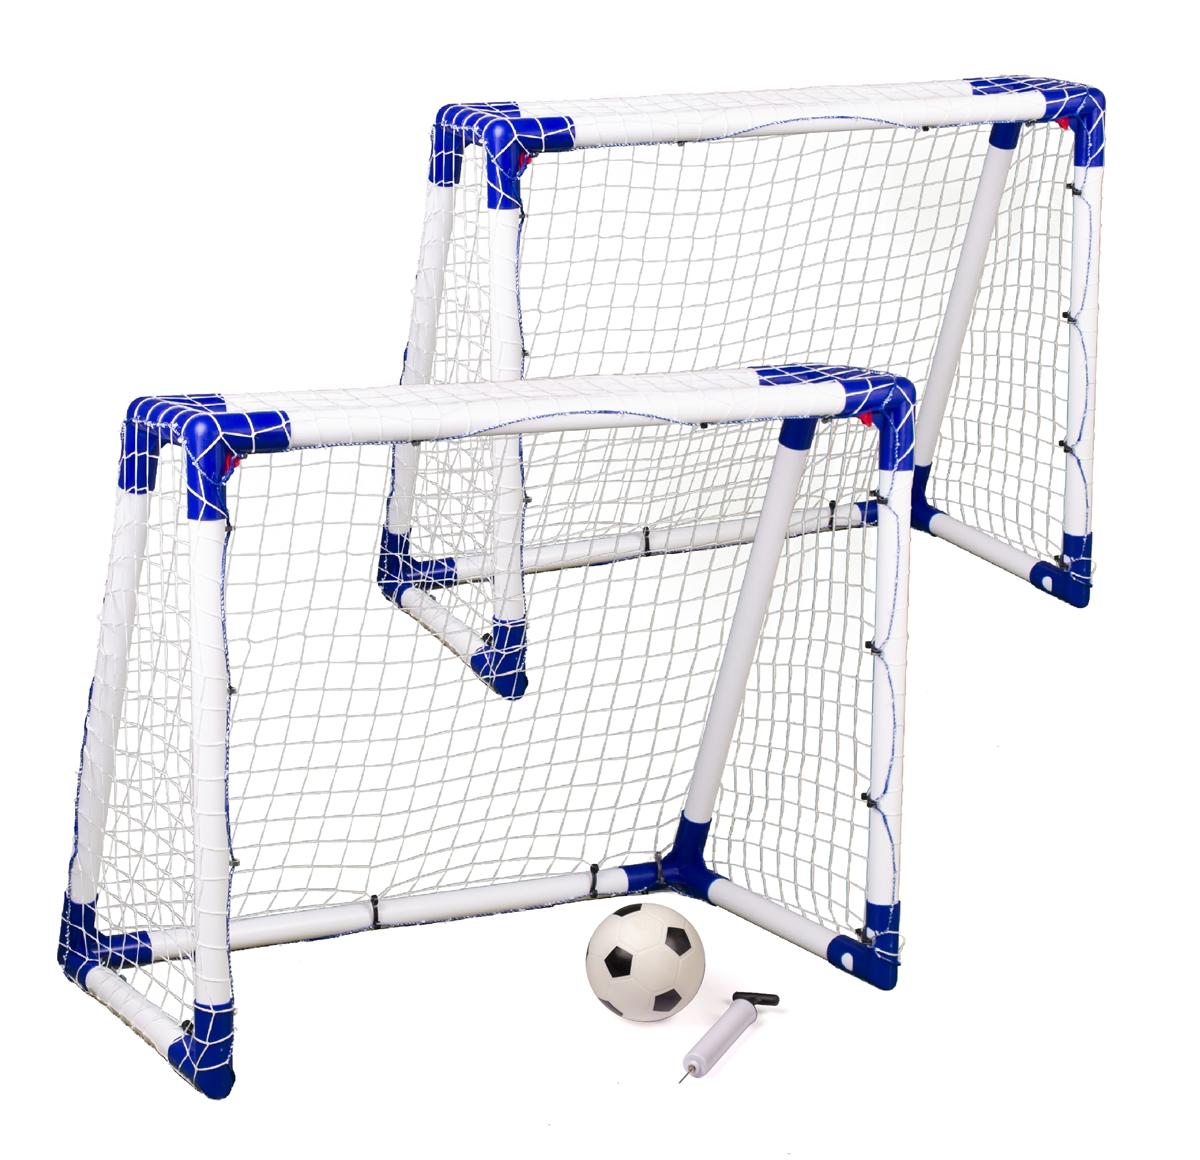 Target-Sport - Junior Goals Set 74 cm x 60 cm x 46 cm (JC8219A)